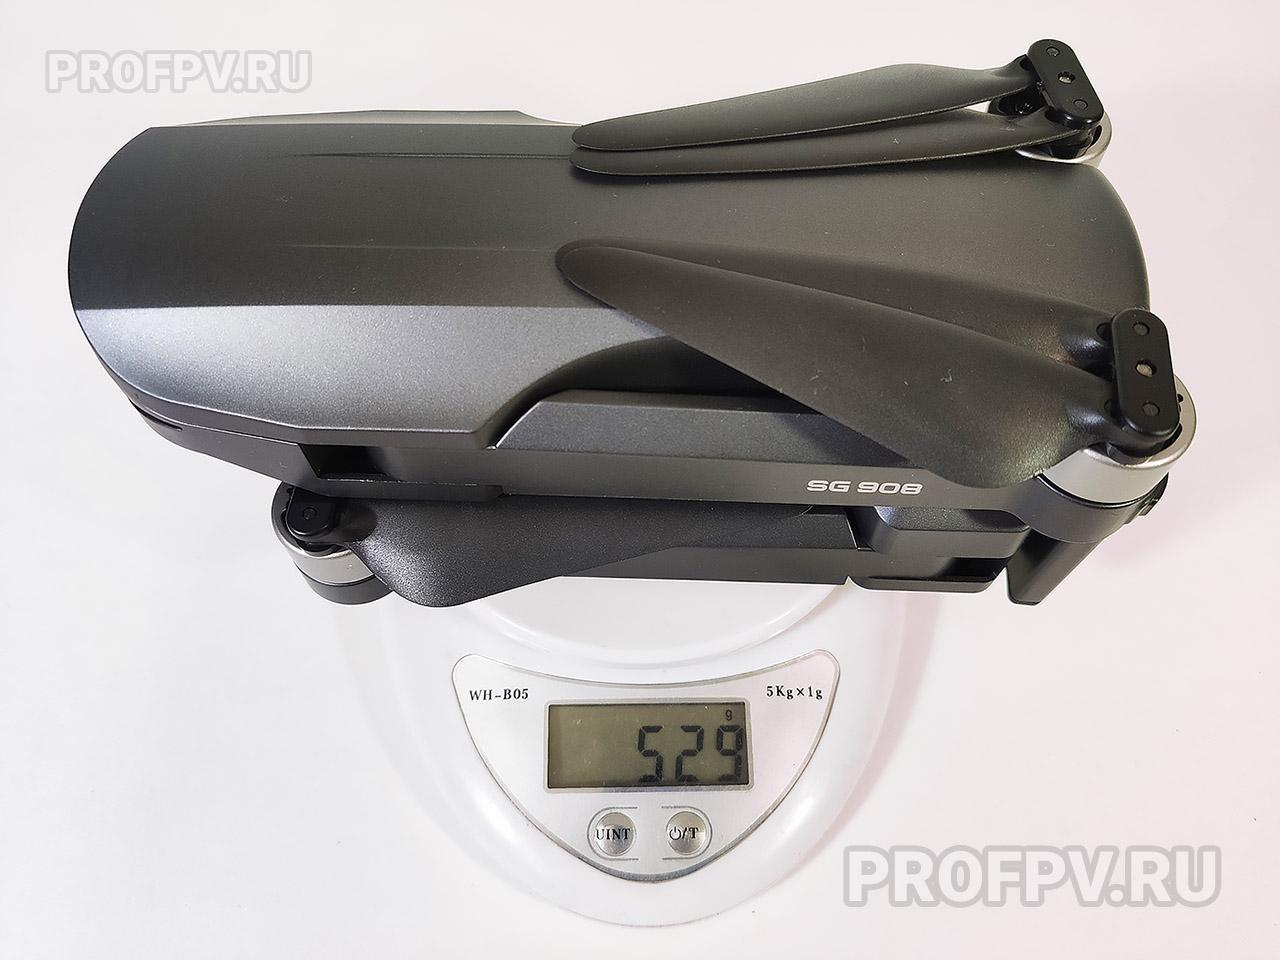 Обзор ZLL SG908: бюджетный съемочный квадрокоптер